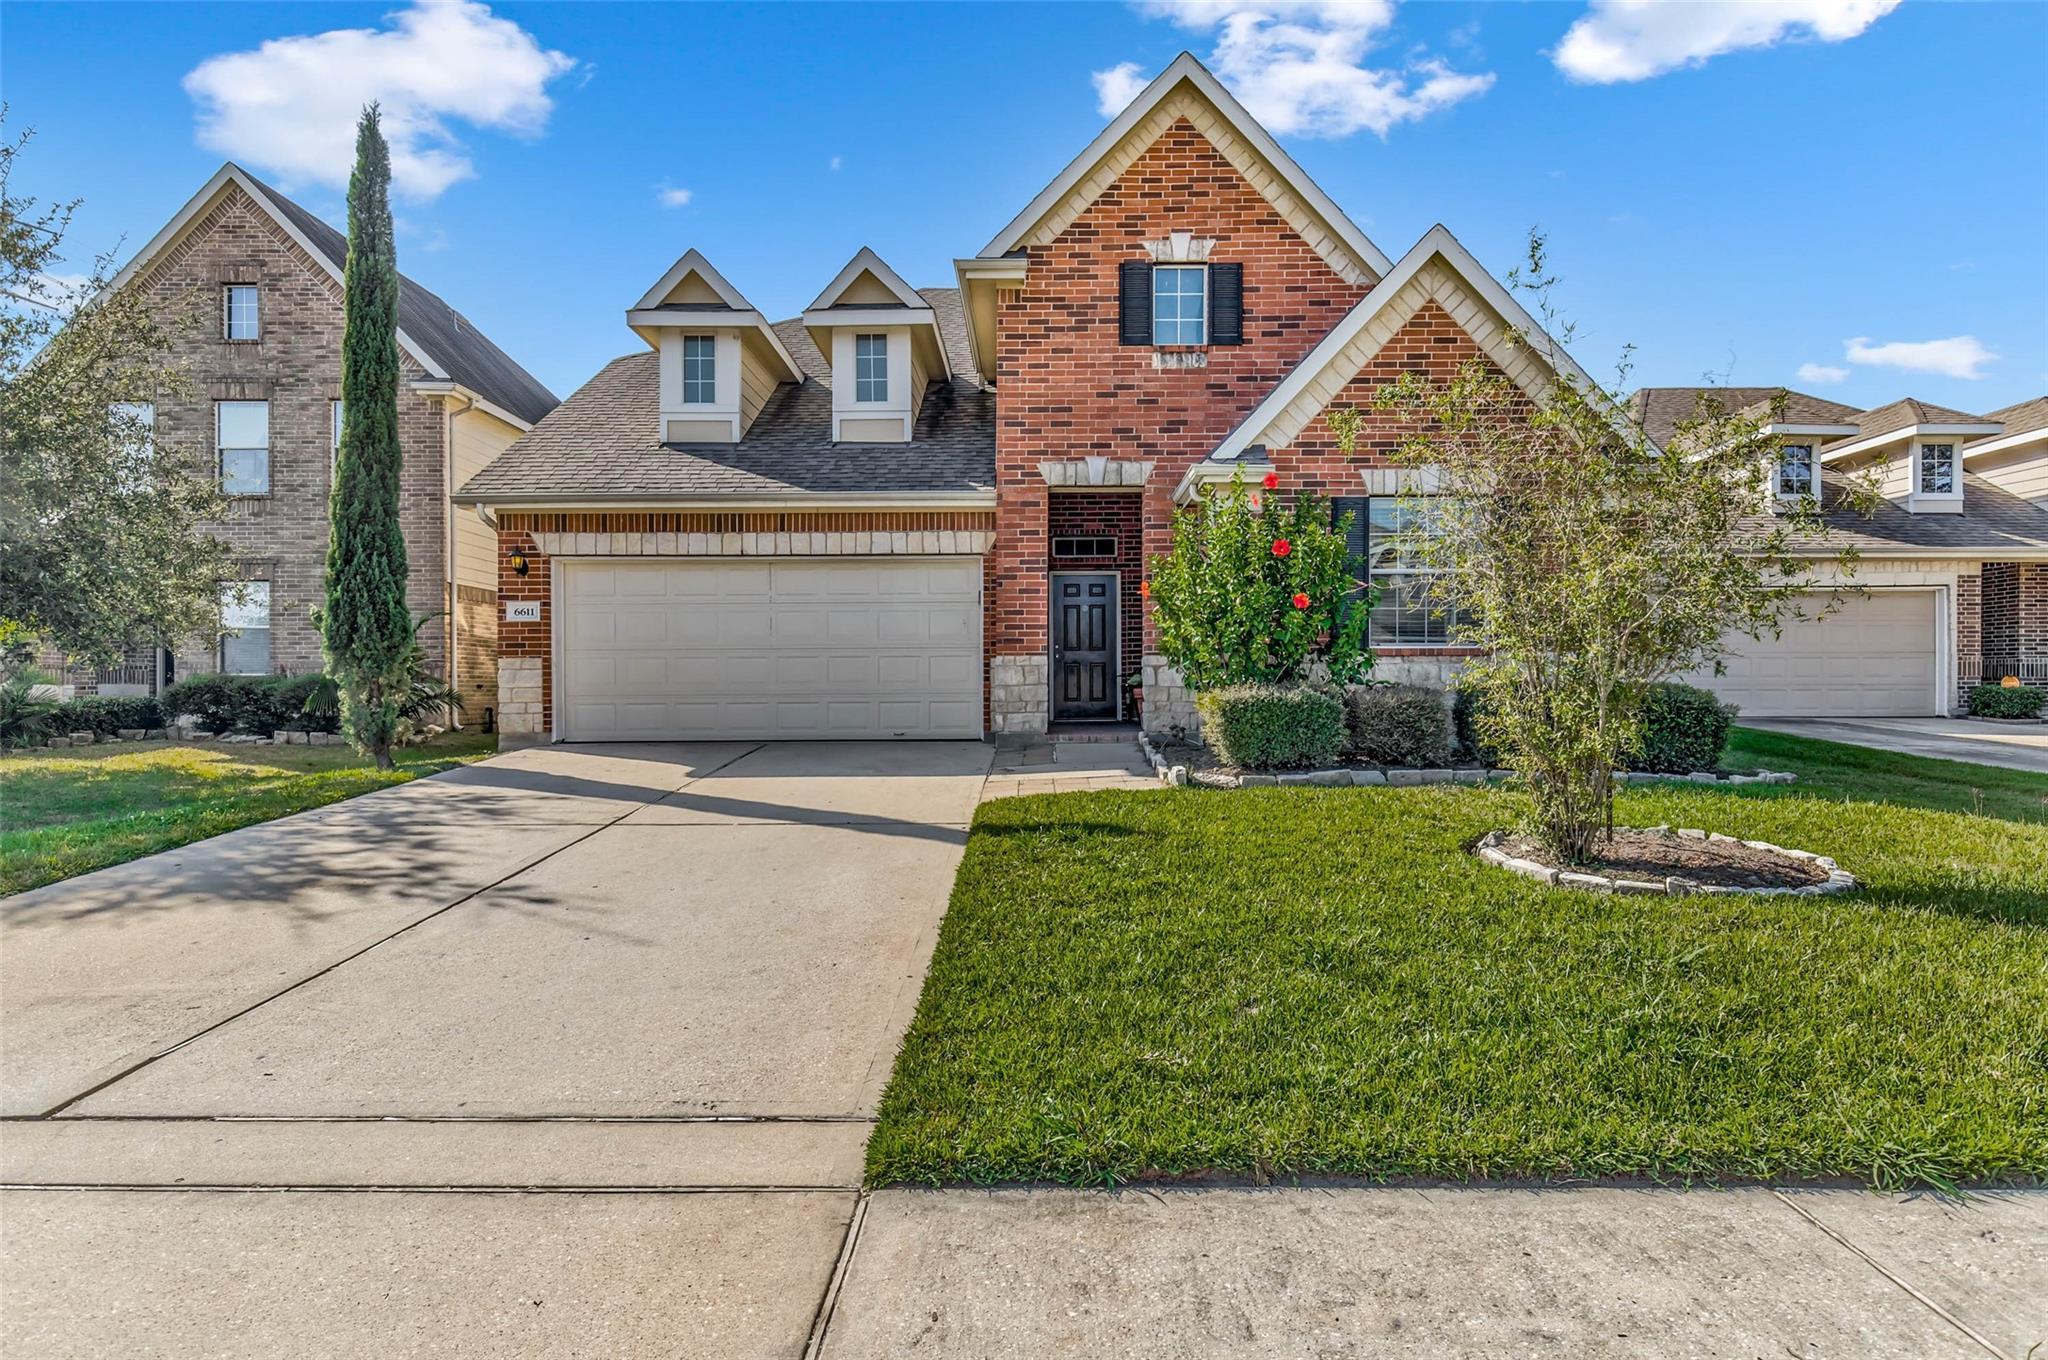 6611 Rusk Landing Ct Court Property Photo - Houston, TX real estate listing